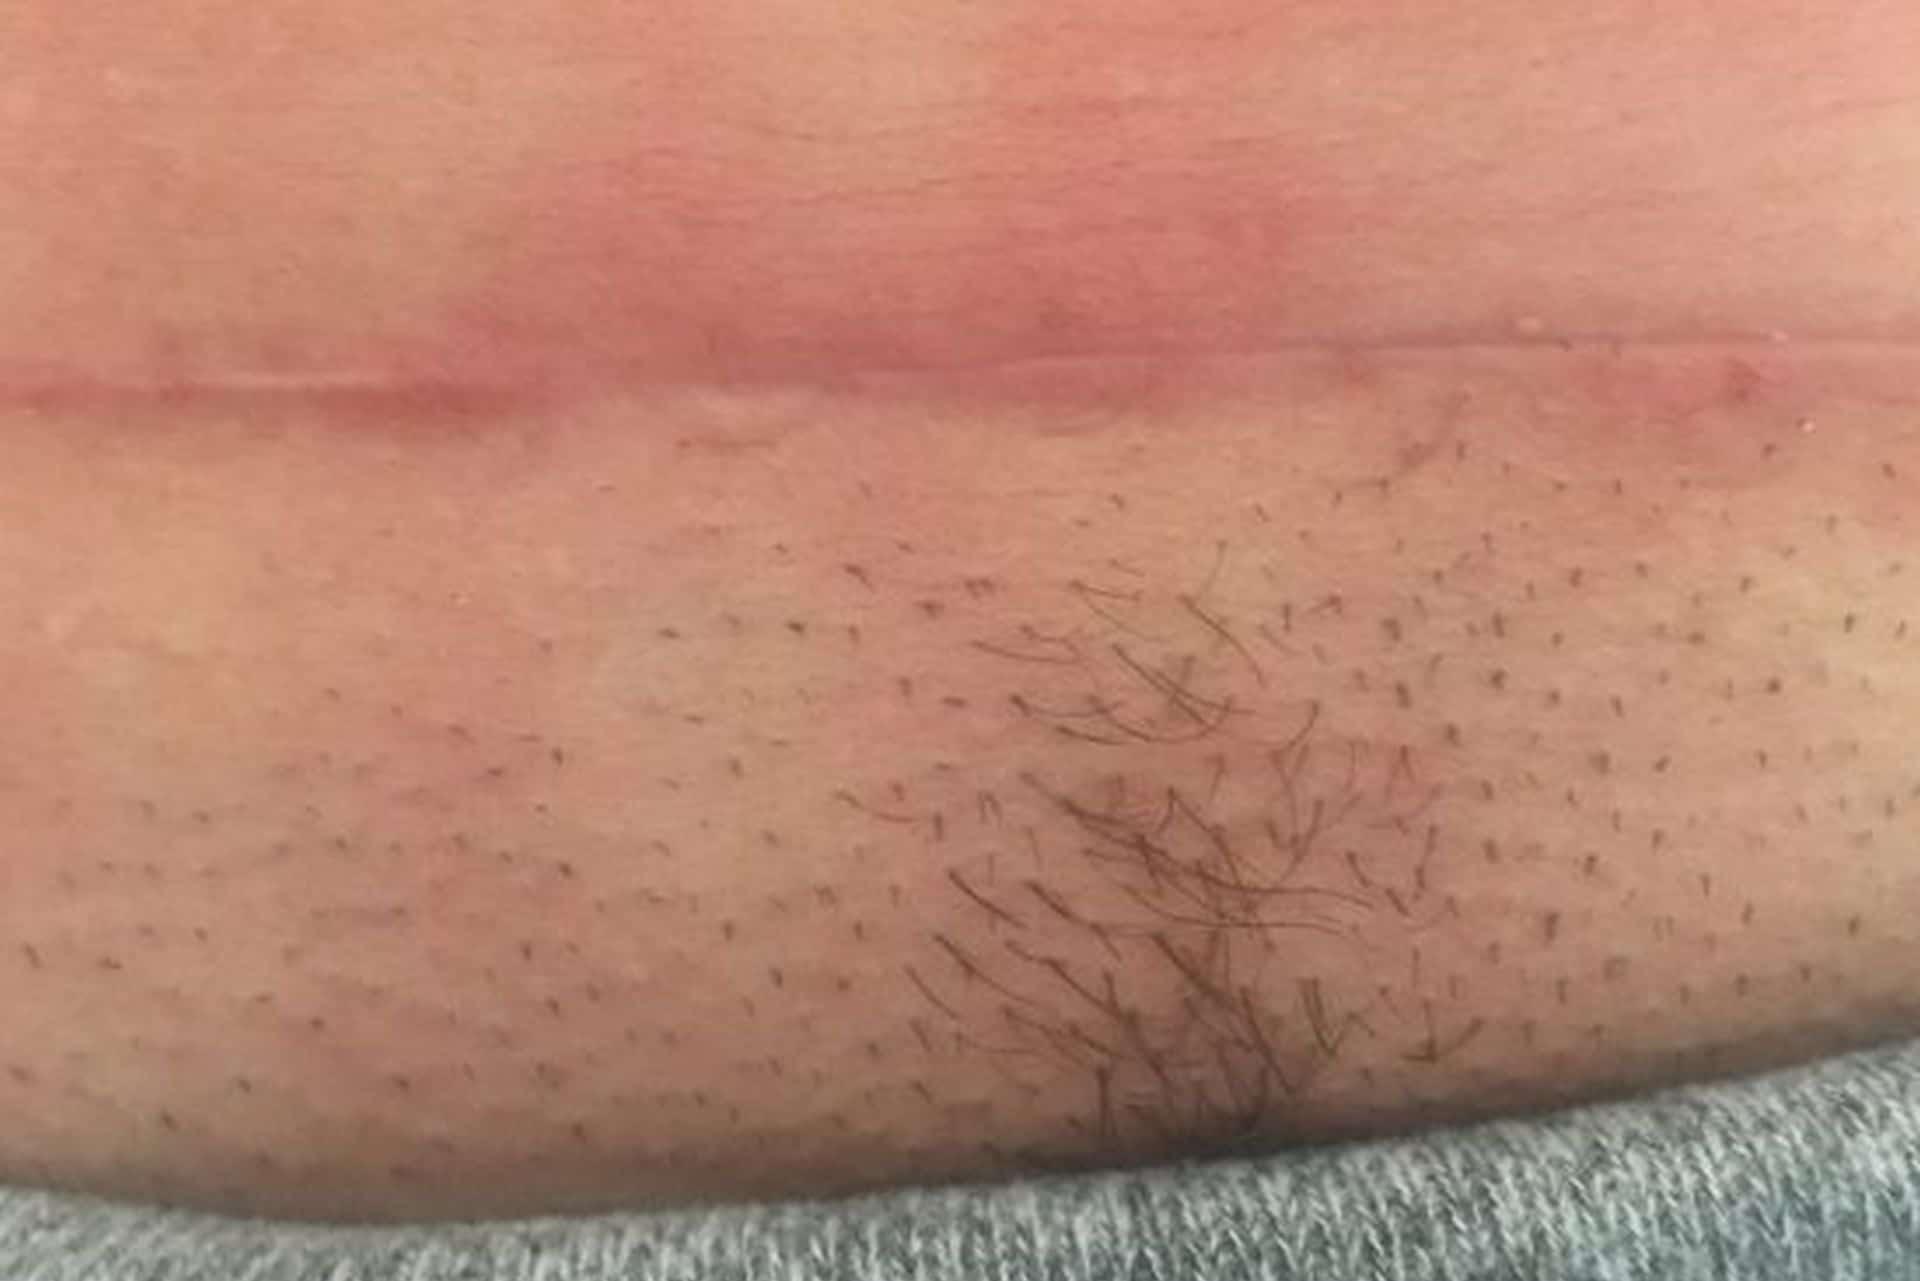 Kaiserschnittnarbe - Ordniation Dr. Url